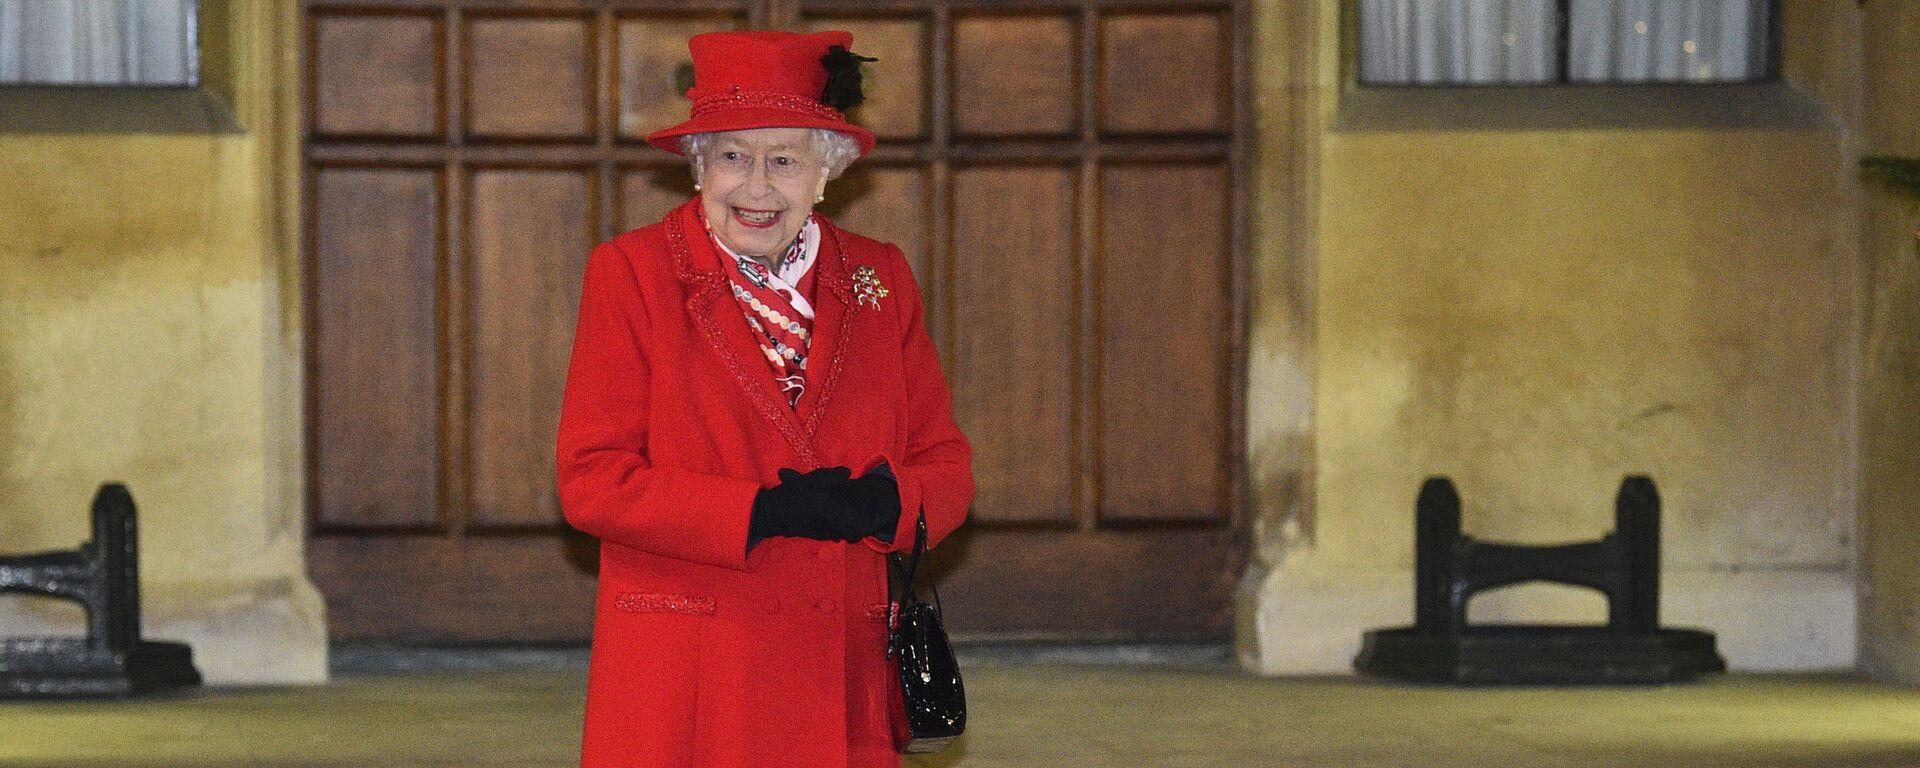 Isabel II, reina británica - Sputnik Mundo, 1920, 03.02.2021